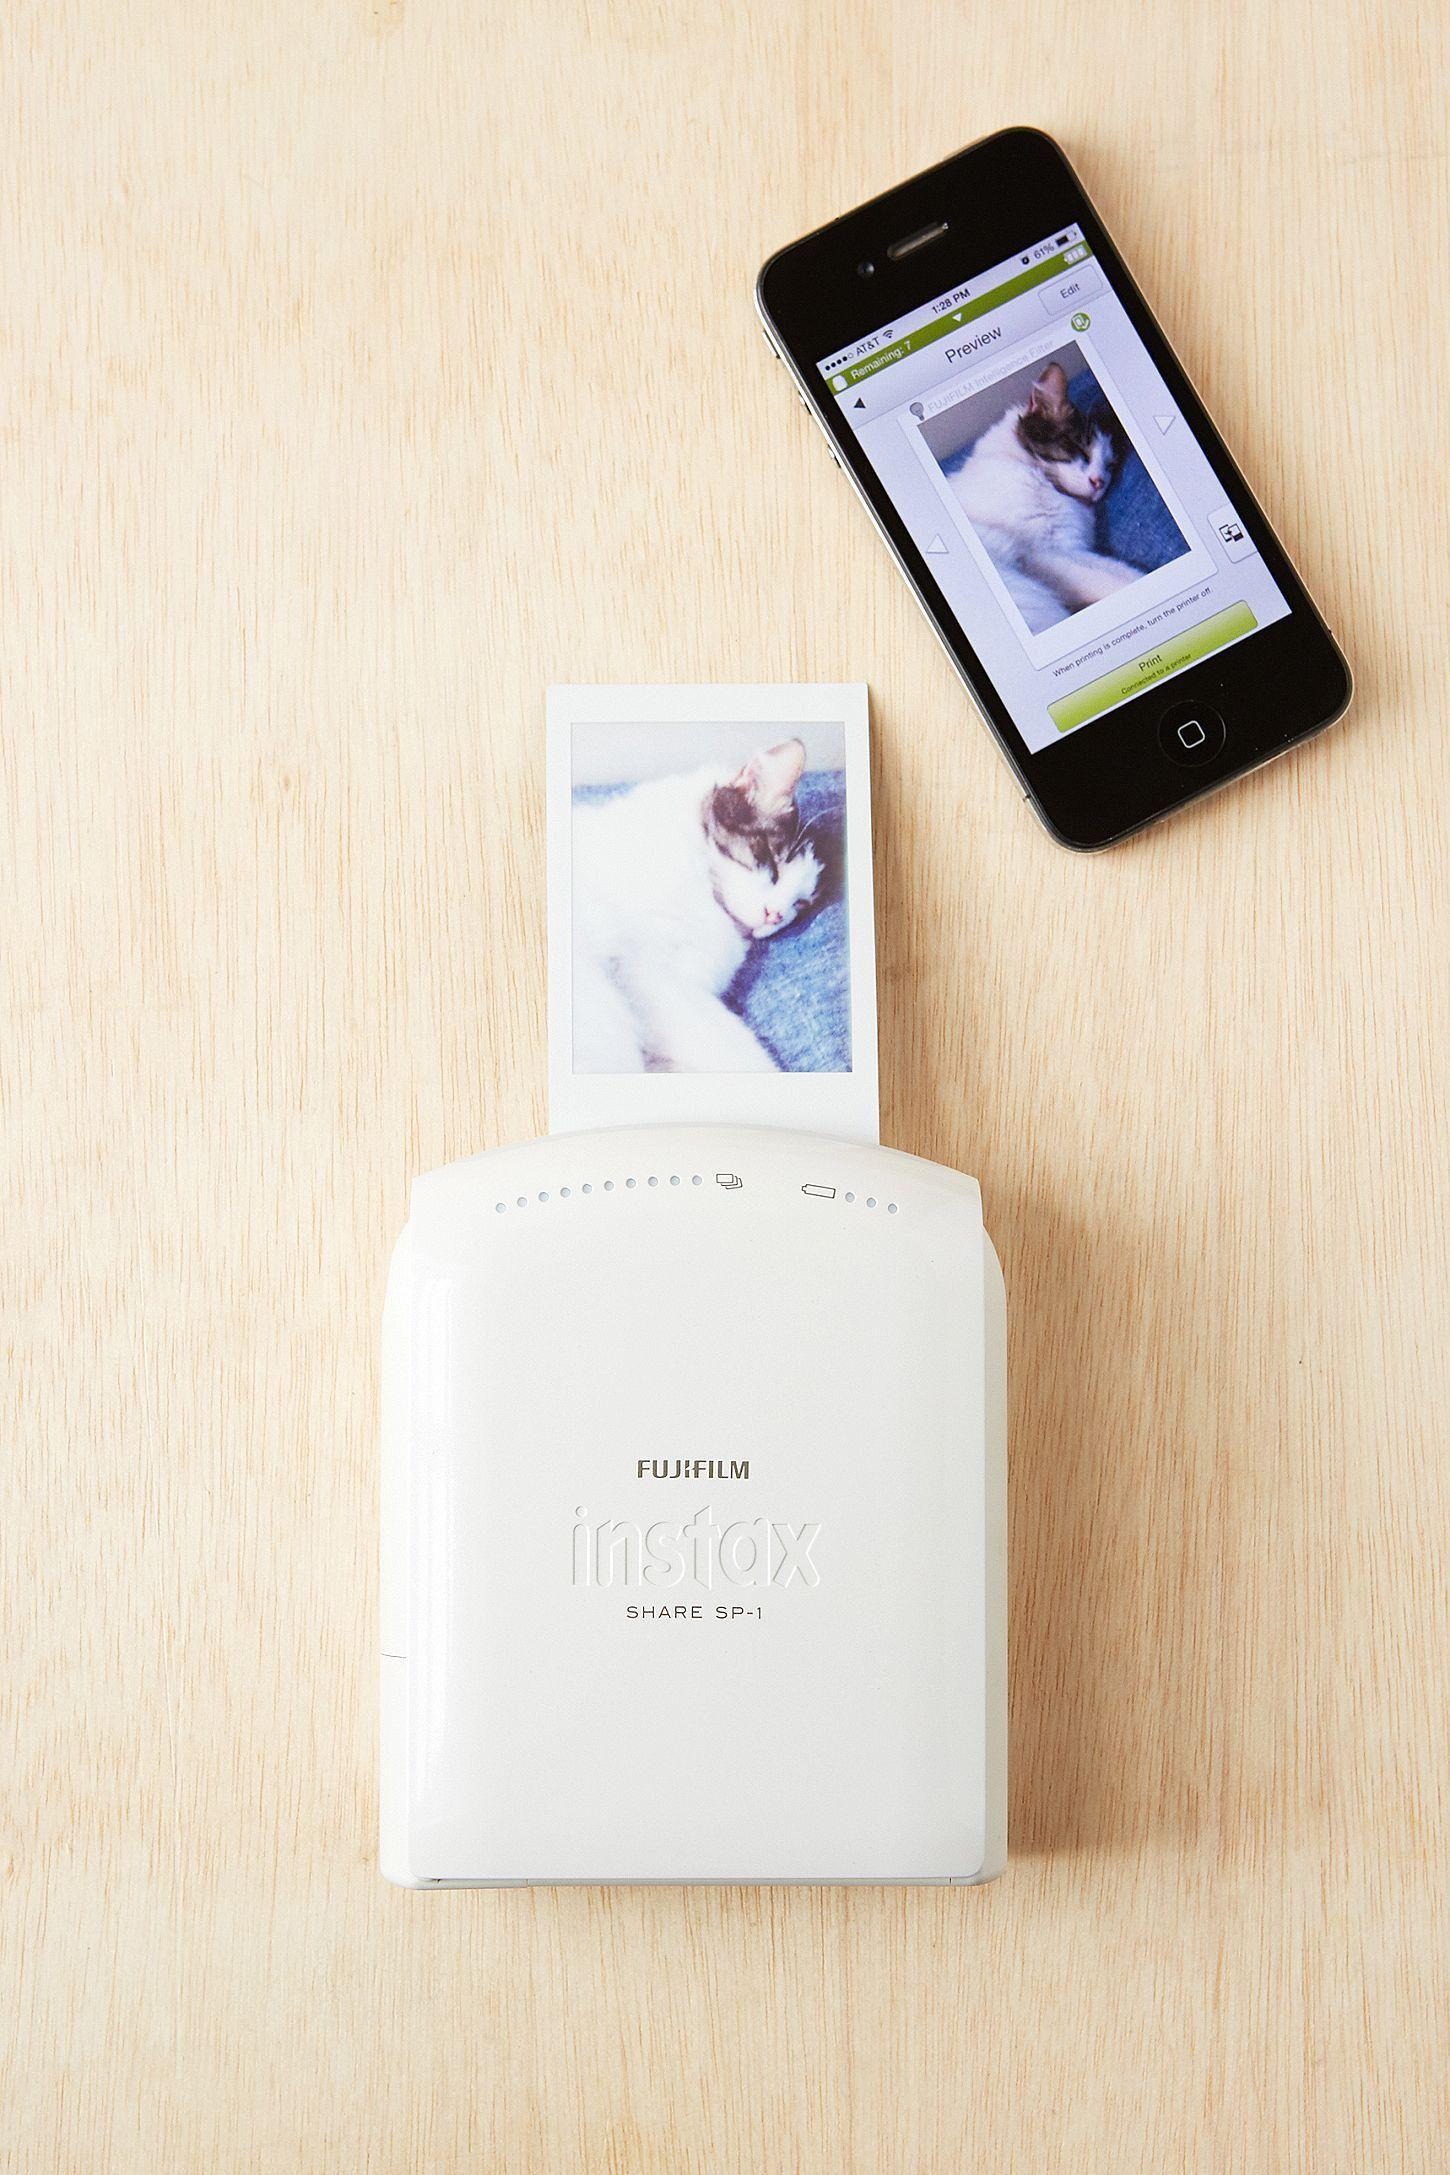 Fujifilm Instax Instant Smartphone Printer Fujifilm Instax Smartphone Printer Instax